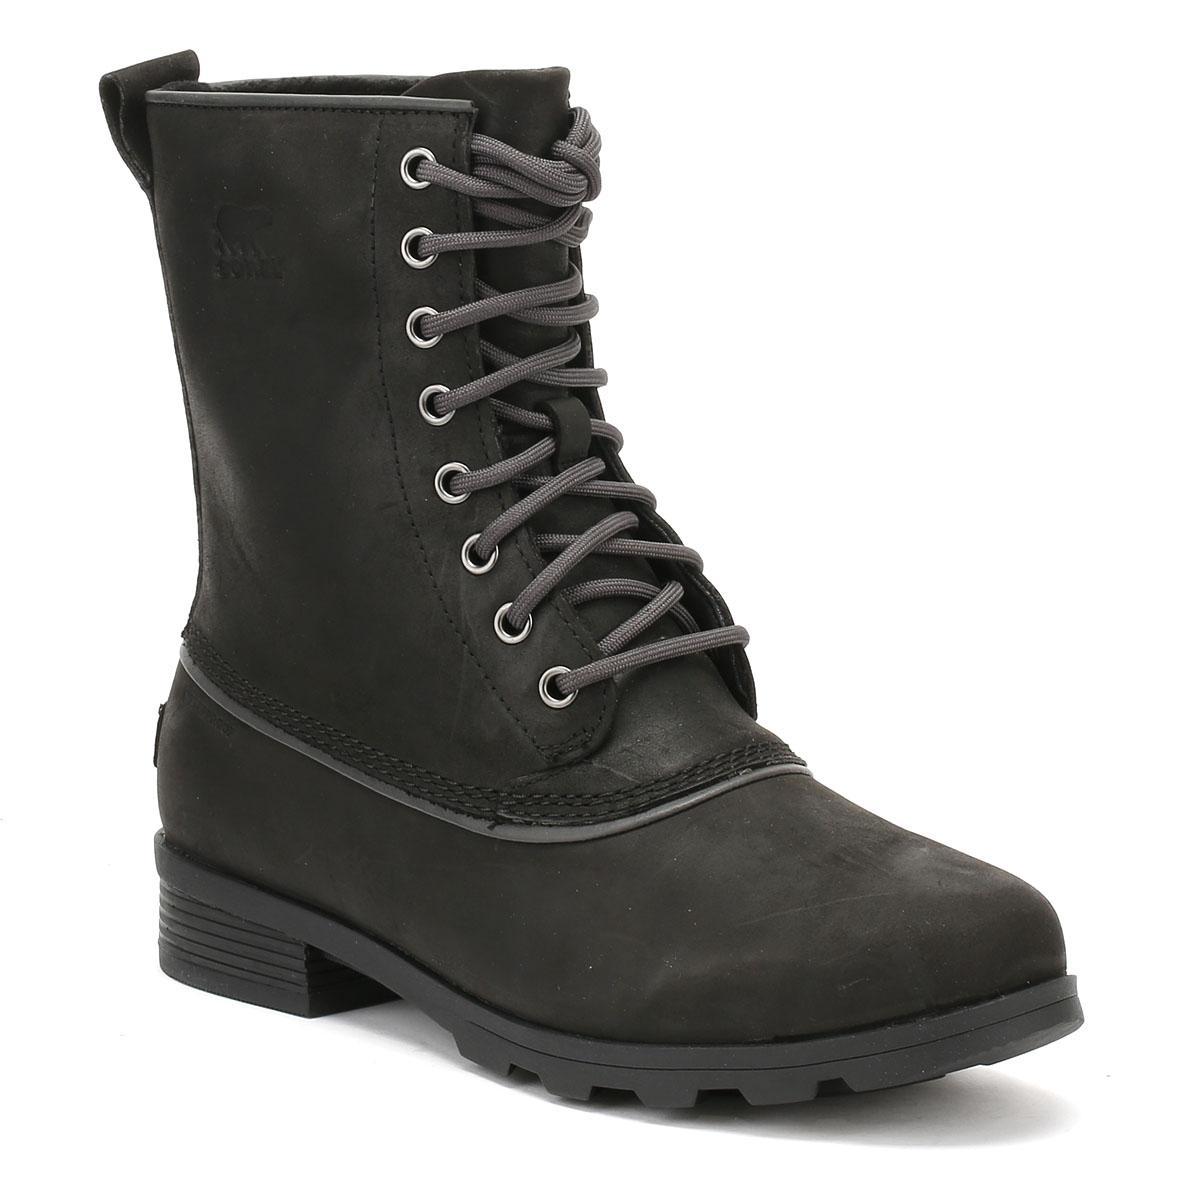 Sorel Leather Womens Black Emelie 1964 Boots Womens High -1314